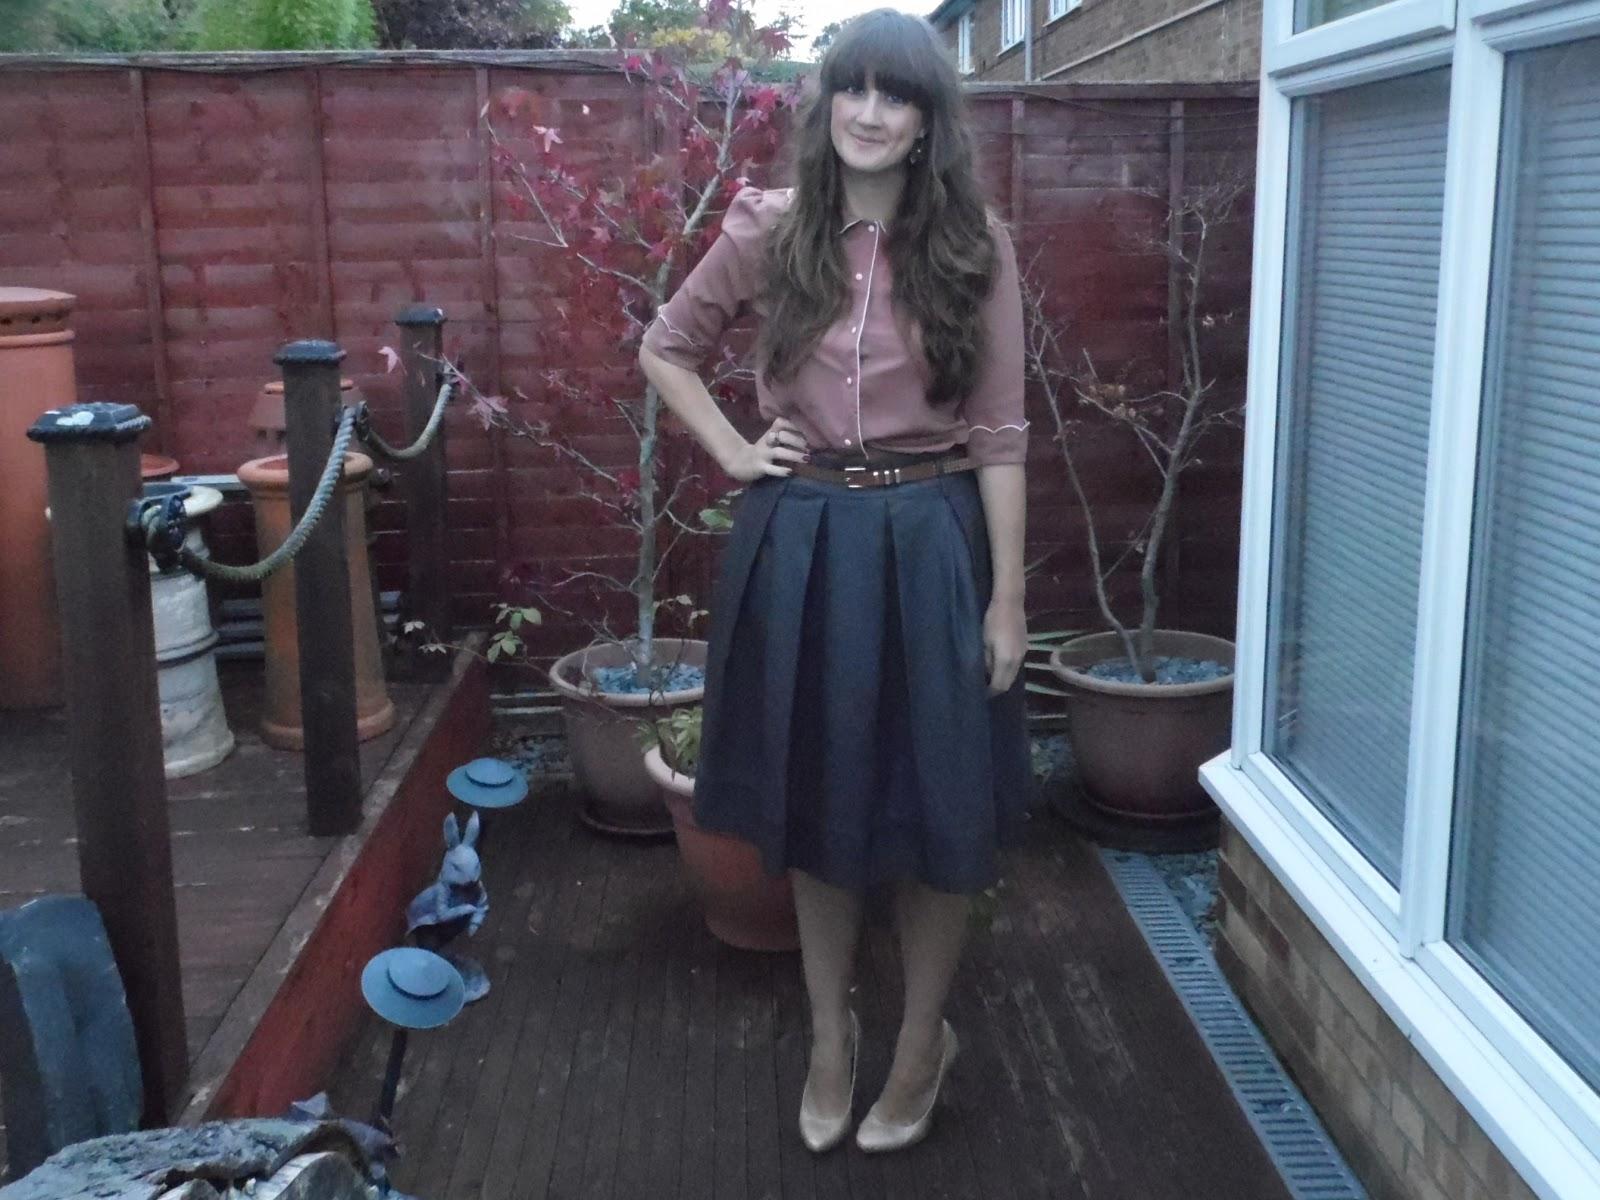 247dee80620 Brown scalloped blouse - Primark Brown midi pleather skirt - Primark Gold  glitter heels - Primark Pink and gold statement ring - Primark